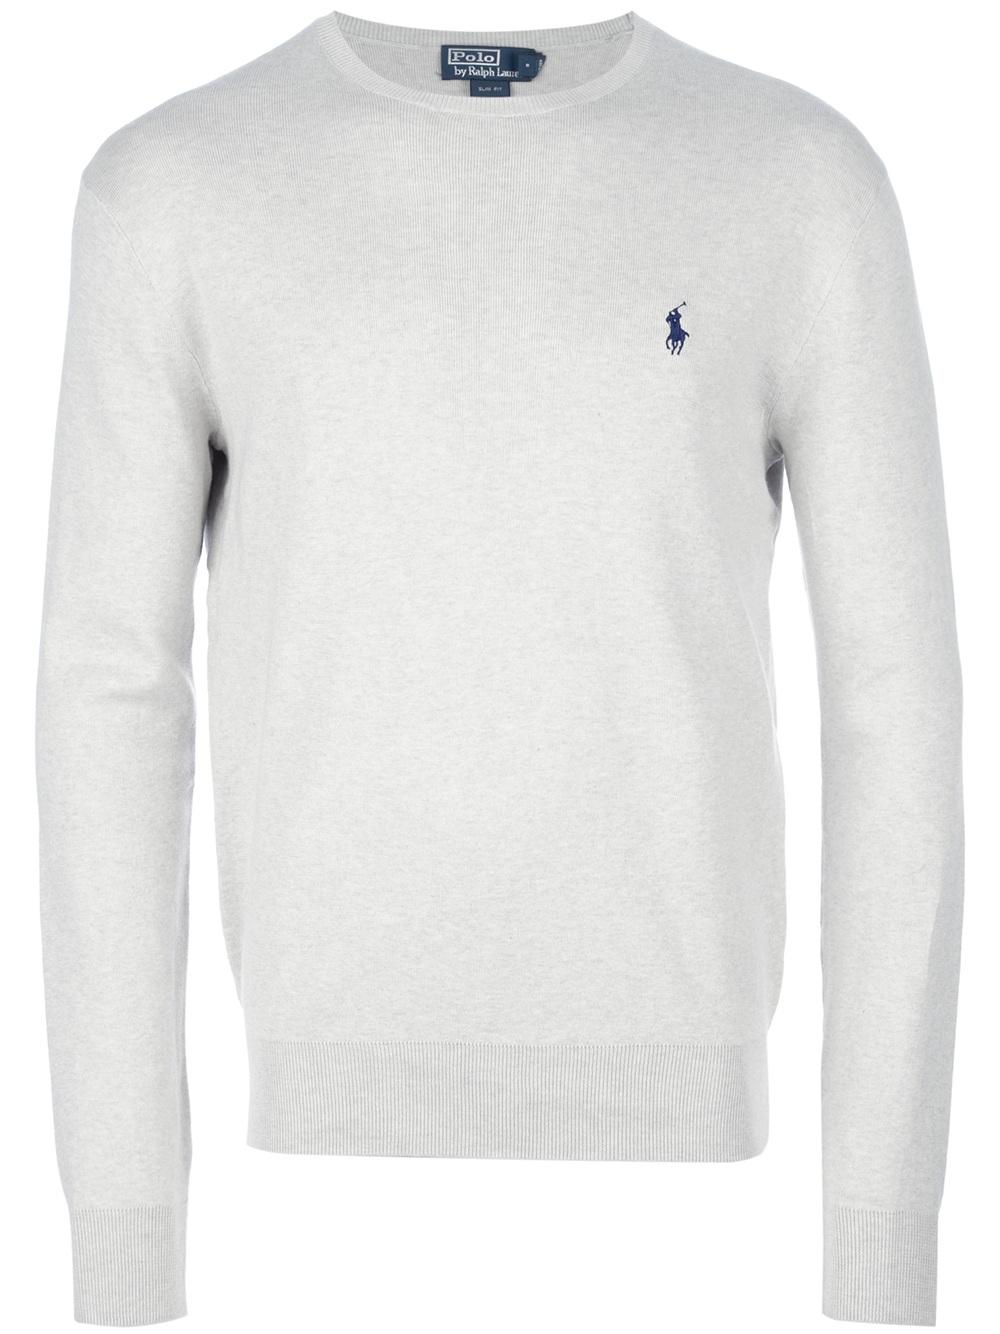 Lyst Polo Ralph Lauren Crew Neck Sweater In White For Men